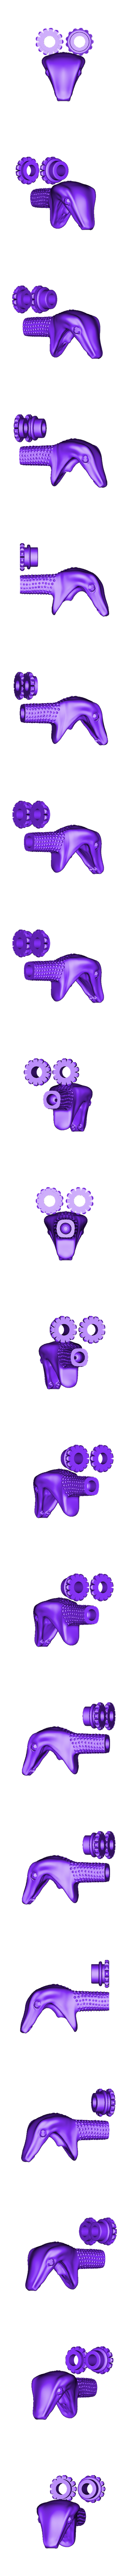 Pome.obj Download 3MF file VARITAS MALFOY Sale • 3D printing design, santuli700